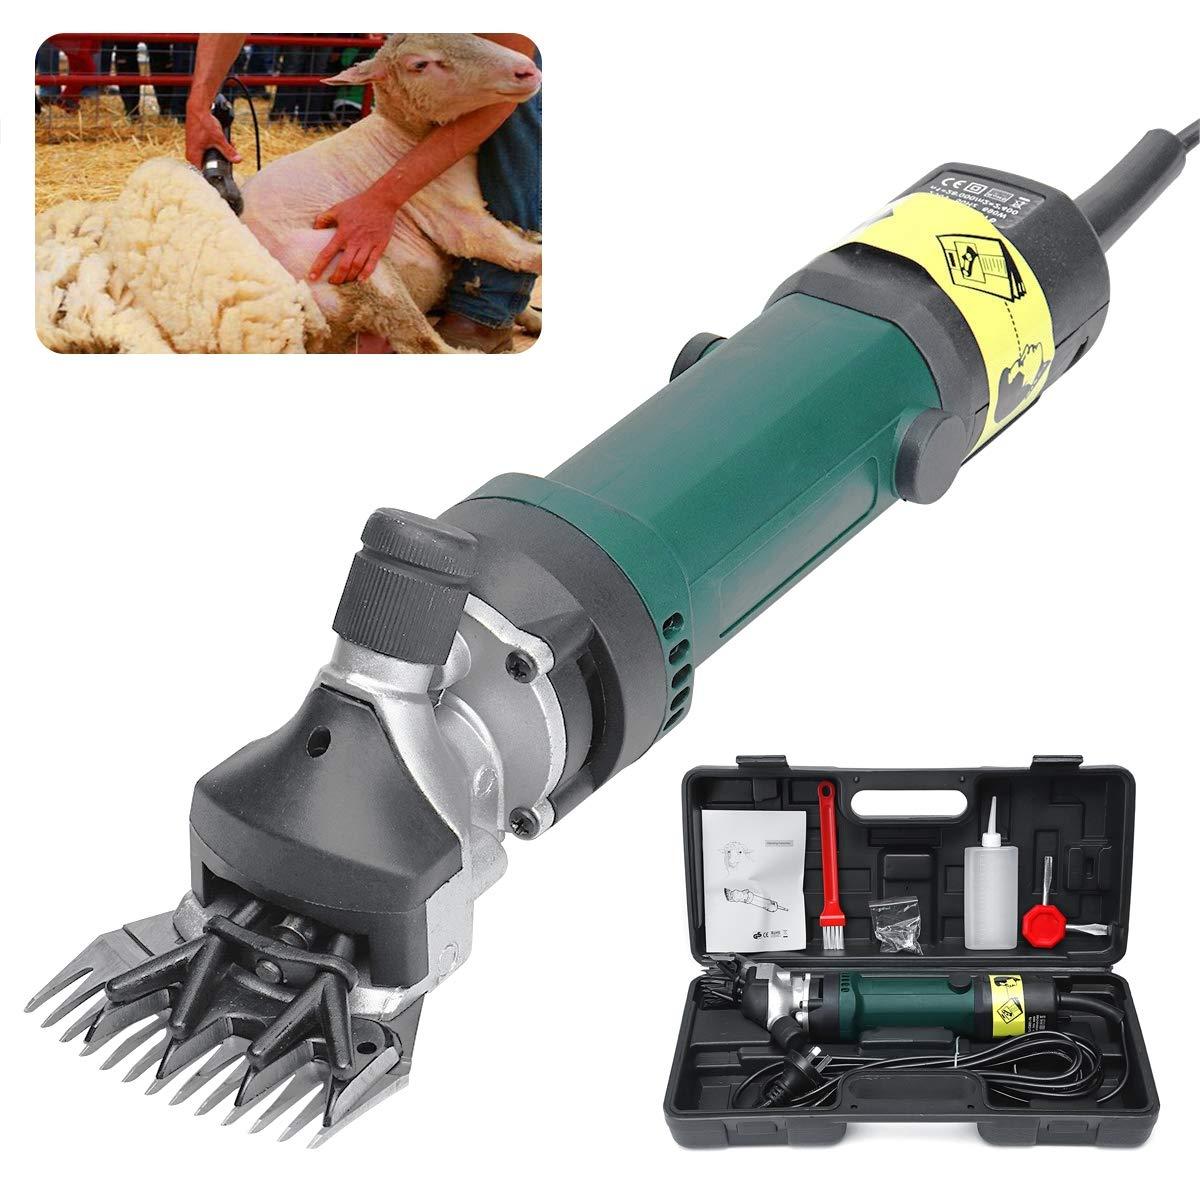 Electric Sheep Shearing Goats Set, Pet Sheep Grooming Wool,6 Speed 13 Teeth 690W Pet Clipper Cutter,220V